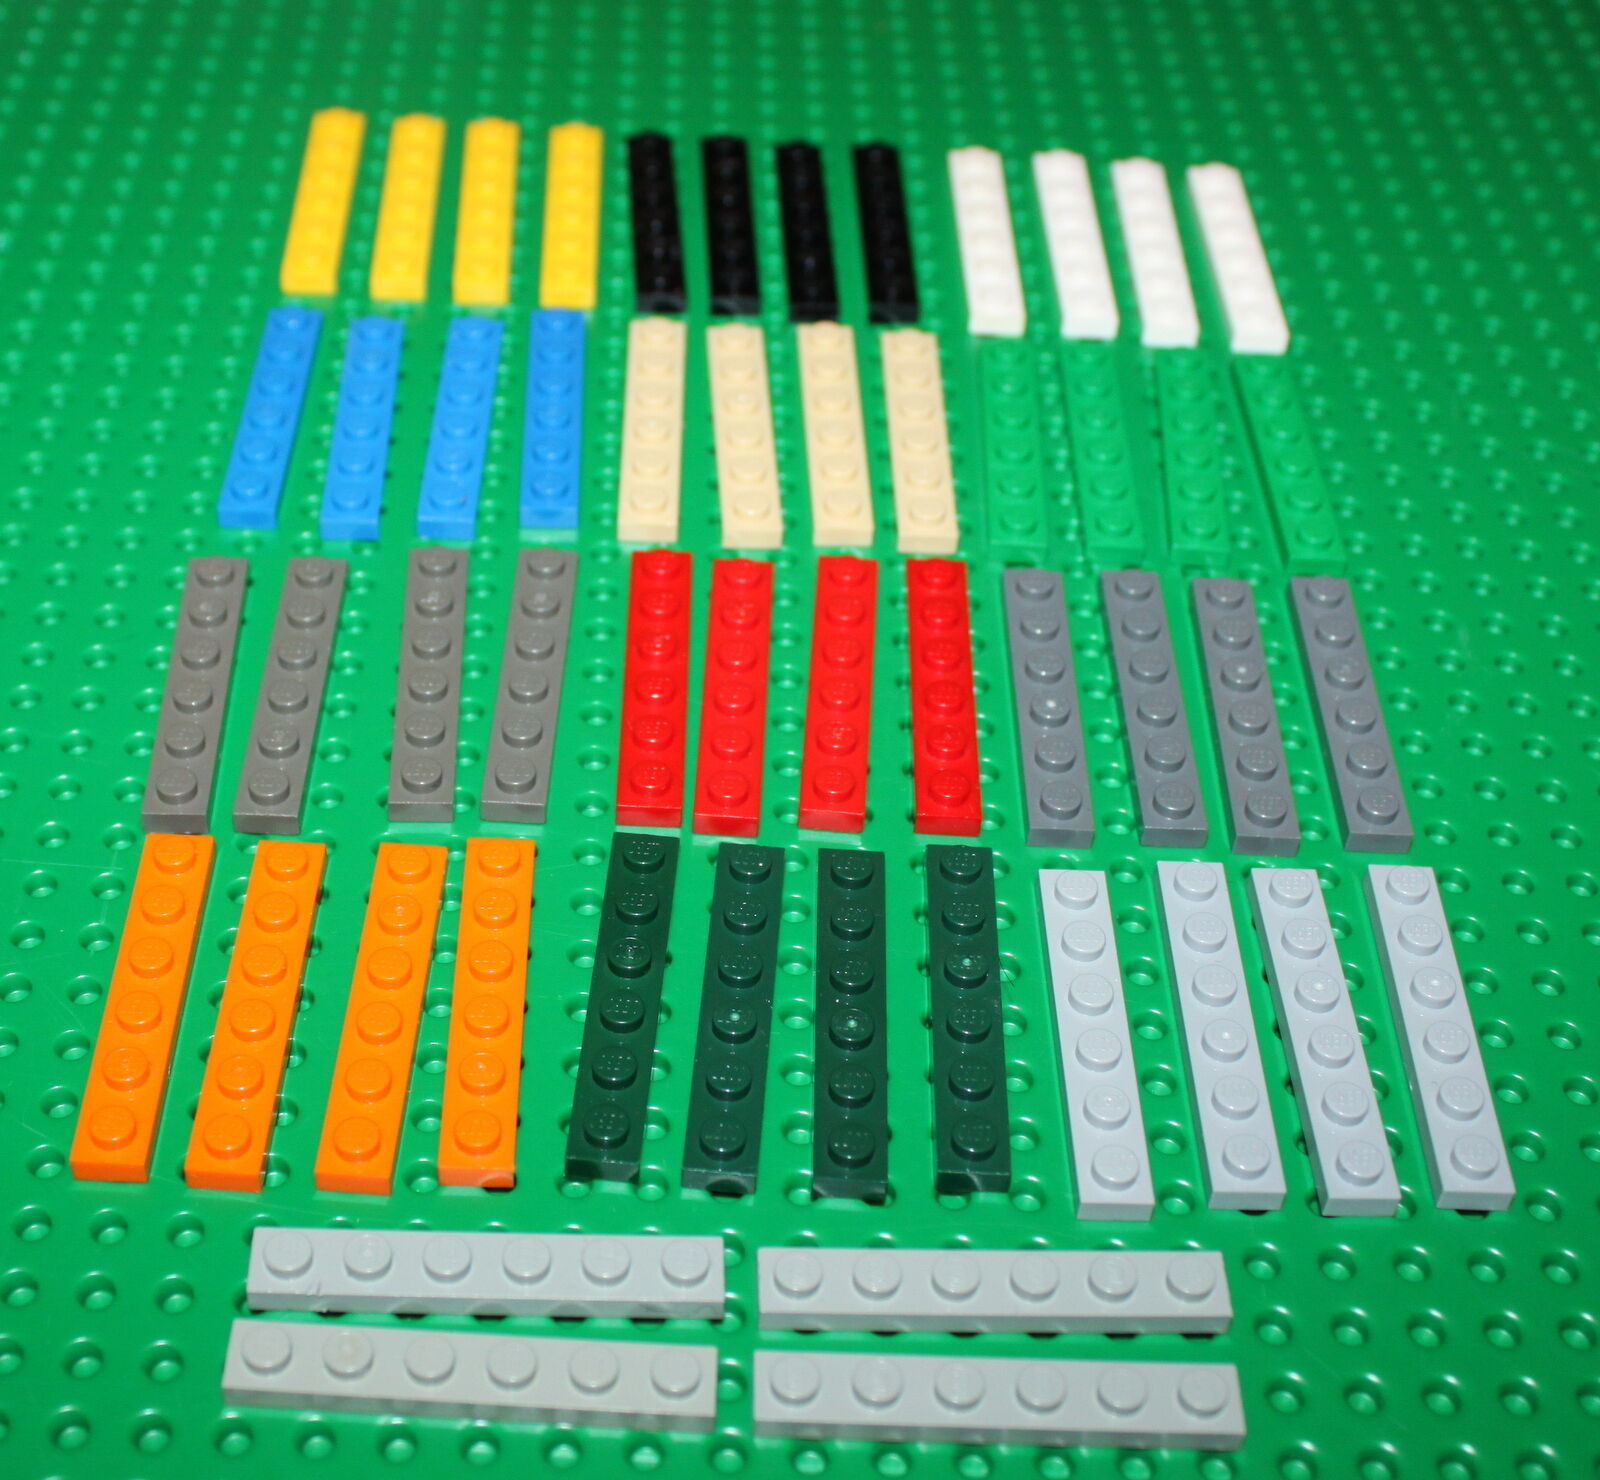 Fliese // Tile 1 x 6 gelb # 6636 4 Stück LEGO